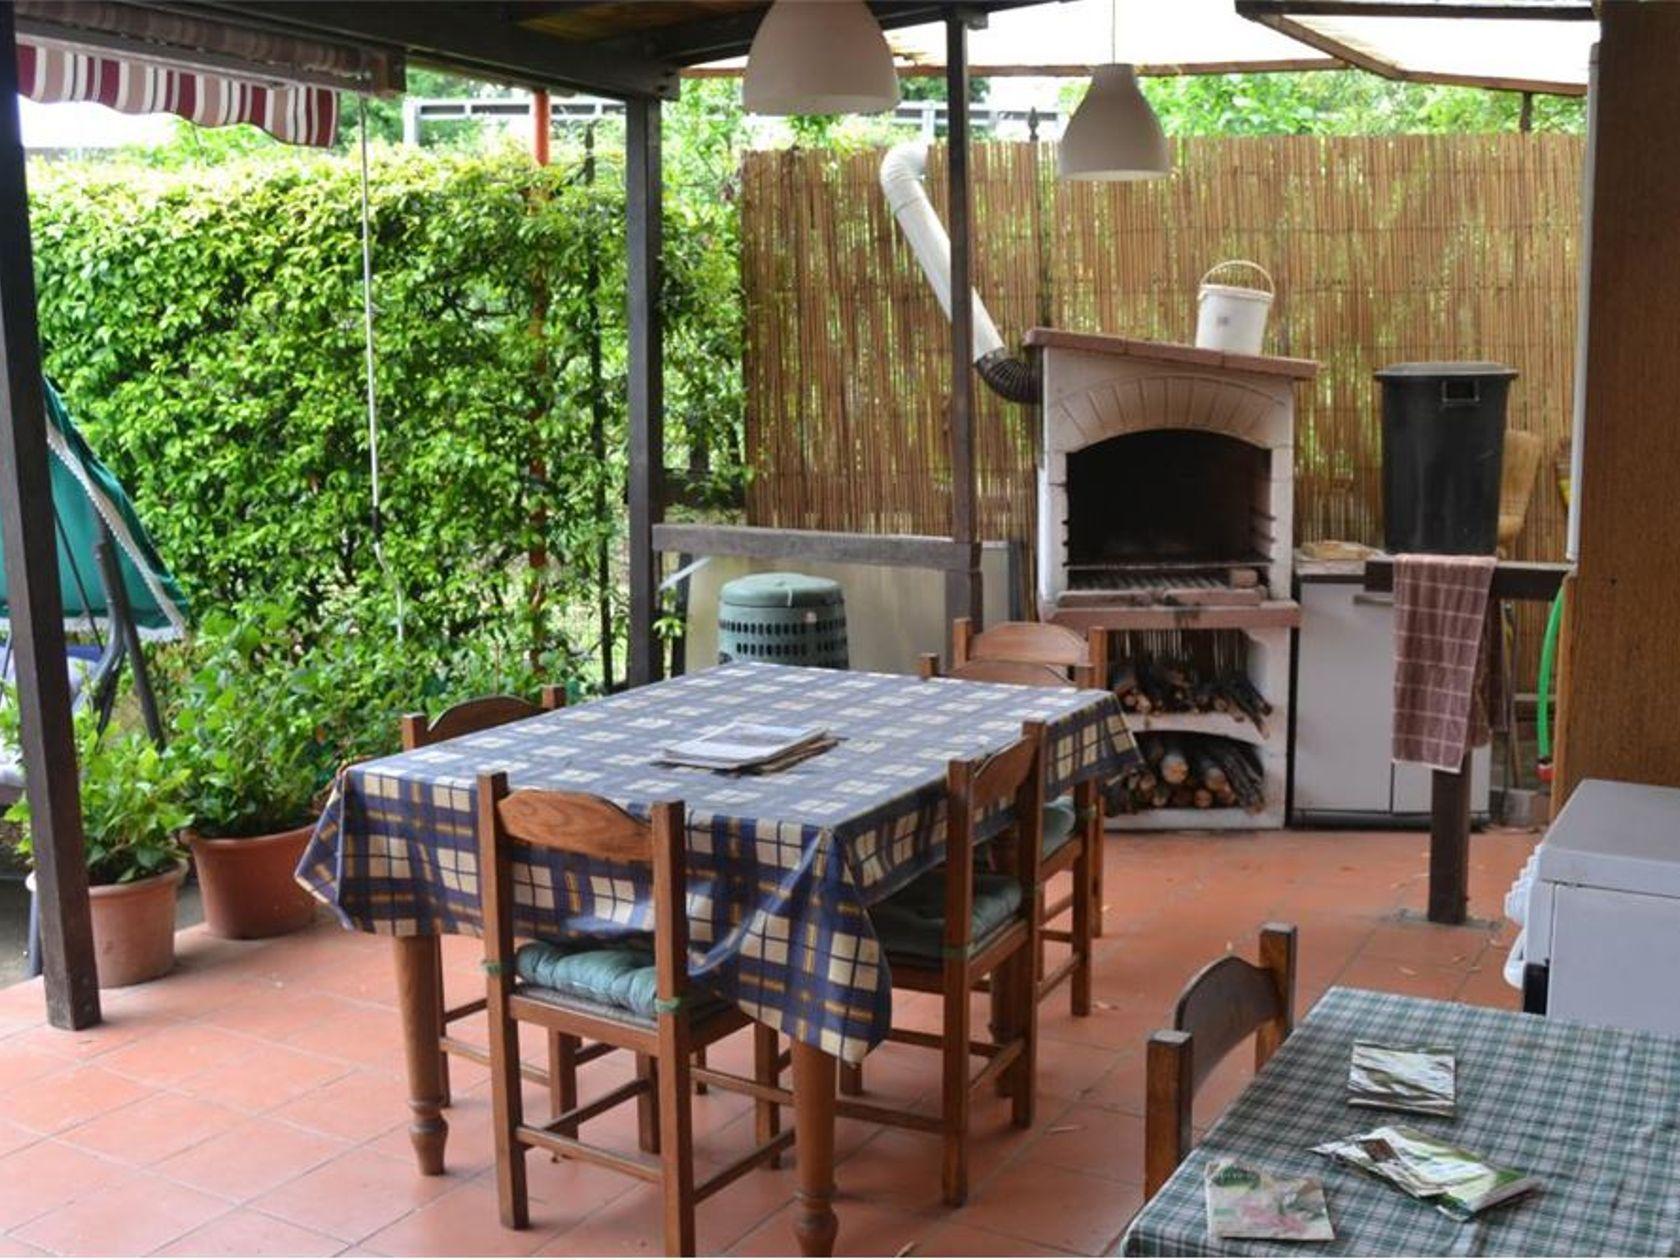 Appartamento Firenze - Firenze Sud Gavinana Europa, Firenze, FI Vendita - Foto 6